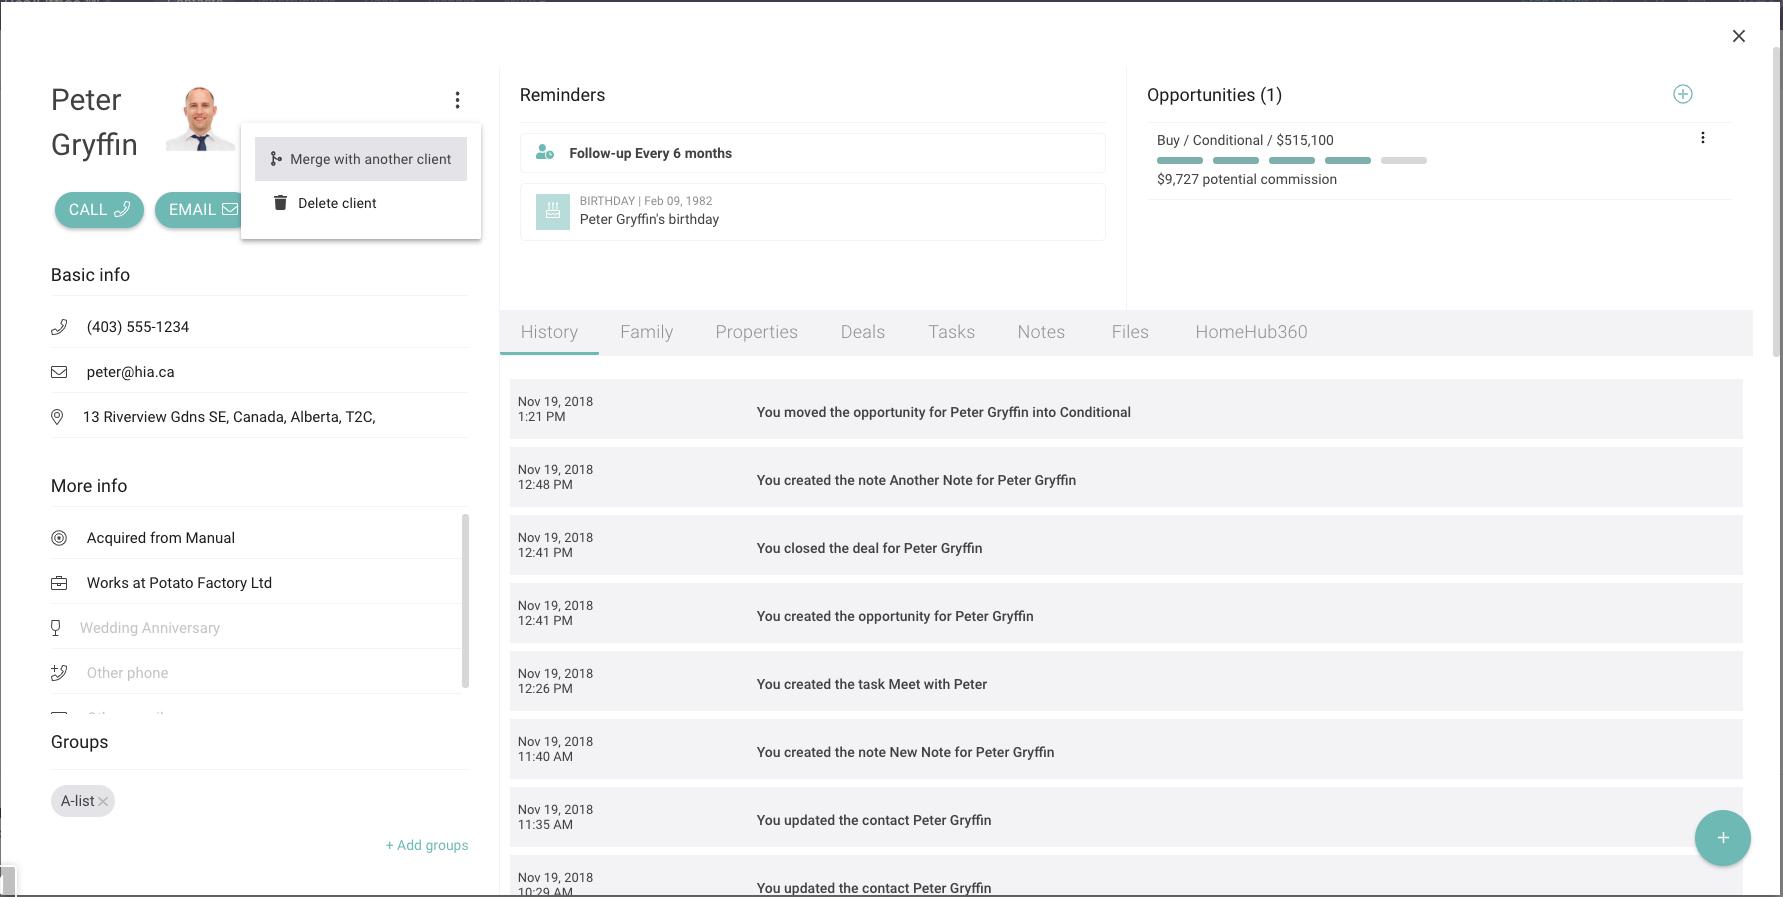 Merge Contact Profile on RealOffice